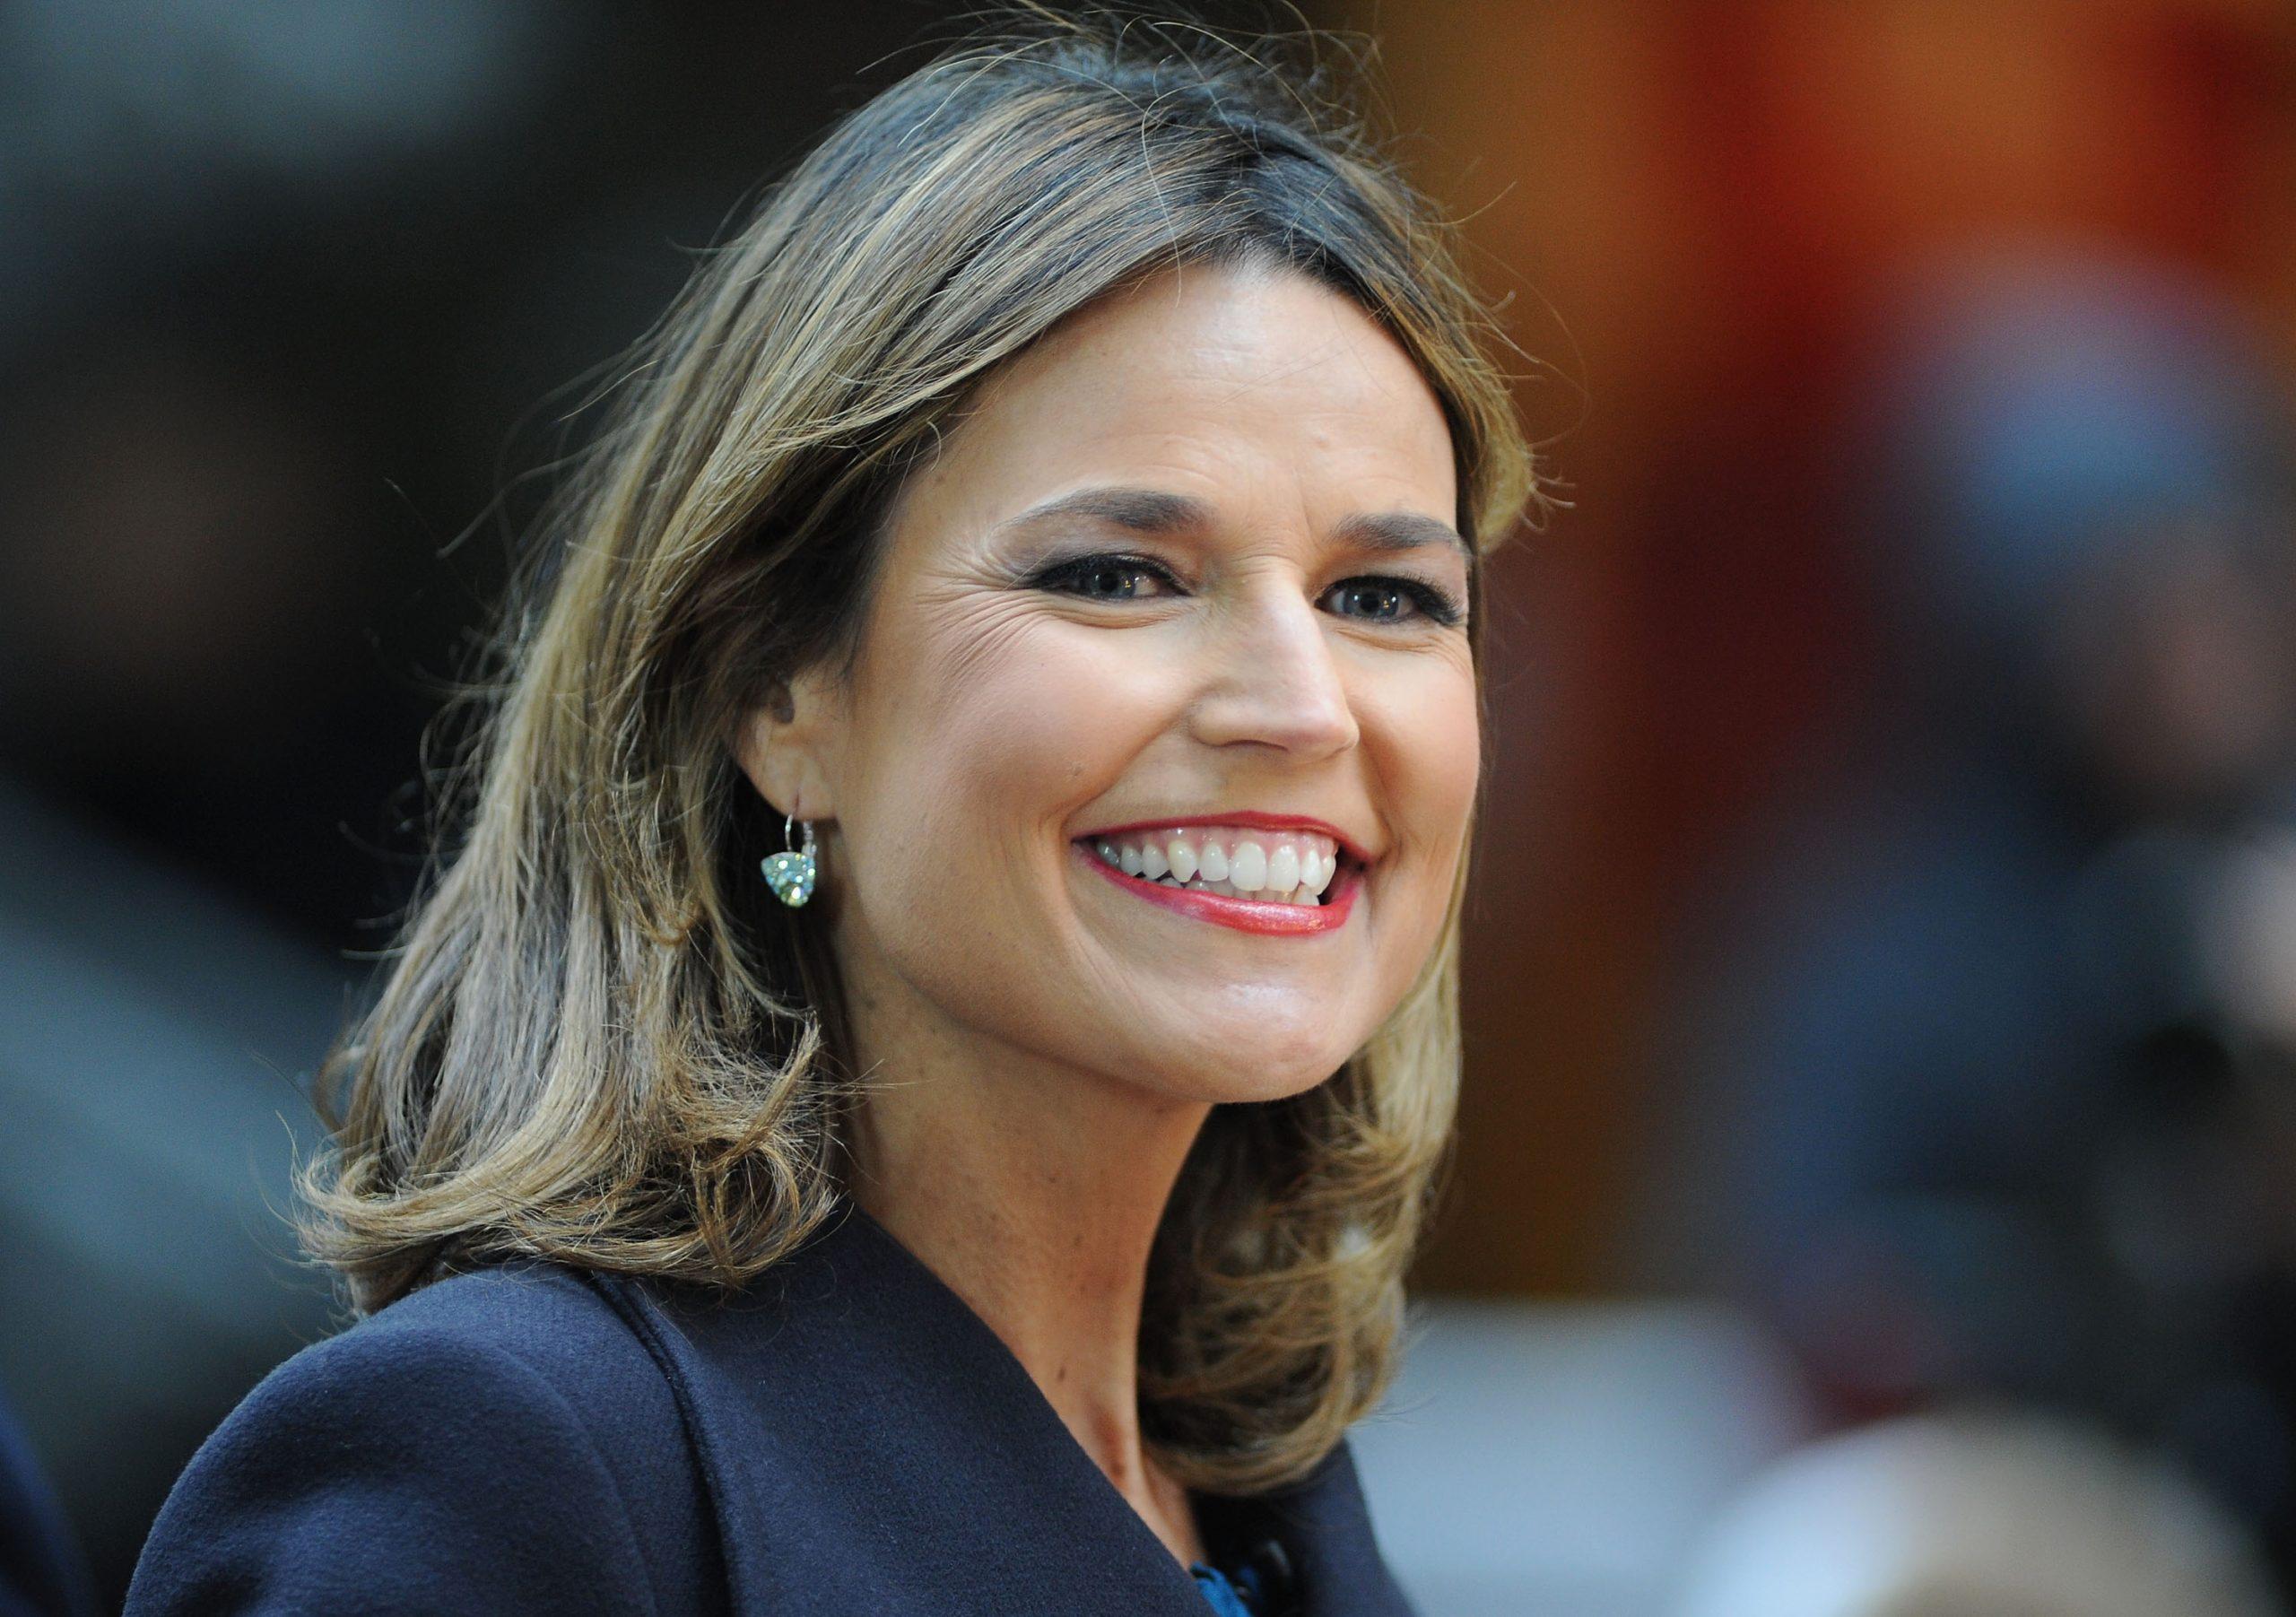 'Today' co-anchor Savannah Guthrie smiles for the camera